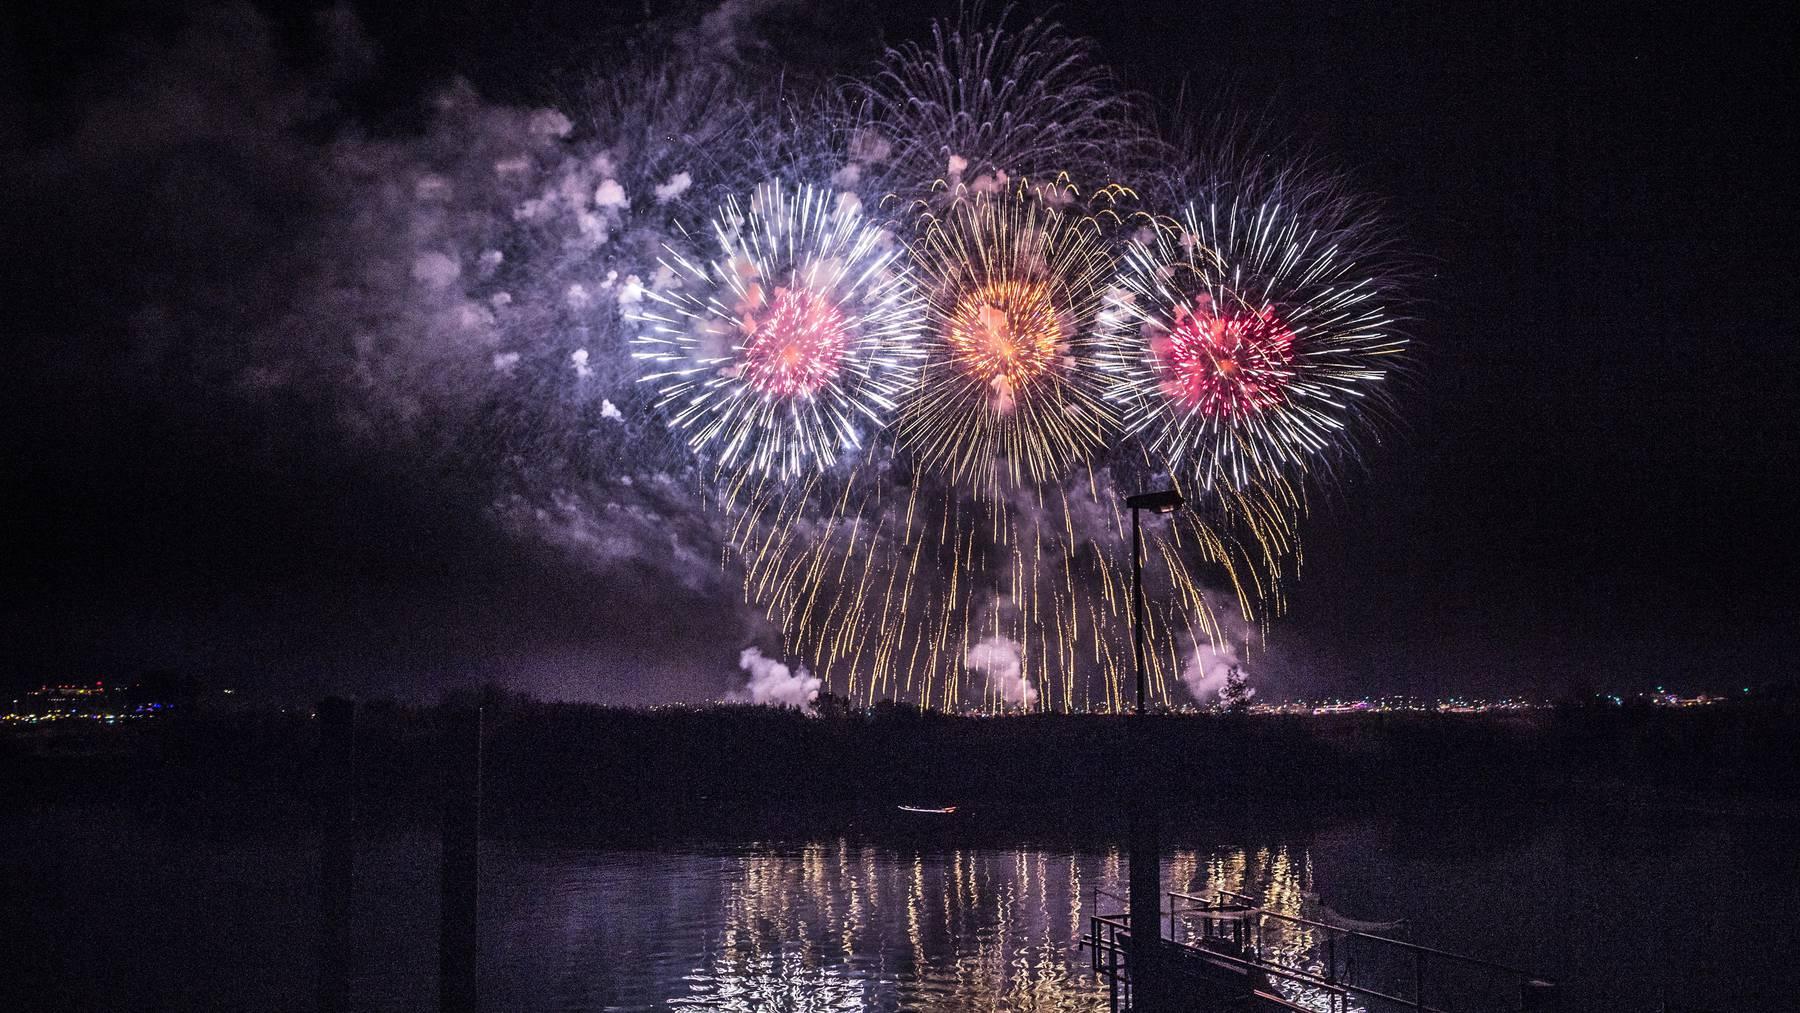 Kaum wegzudenken: Feuerwerke an Seenachtsfesten – wie hier in Kreuzlingen. (Archivbild)